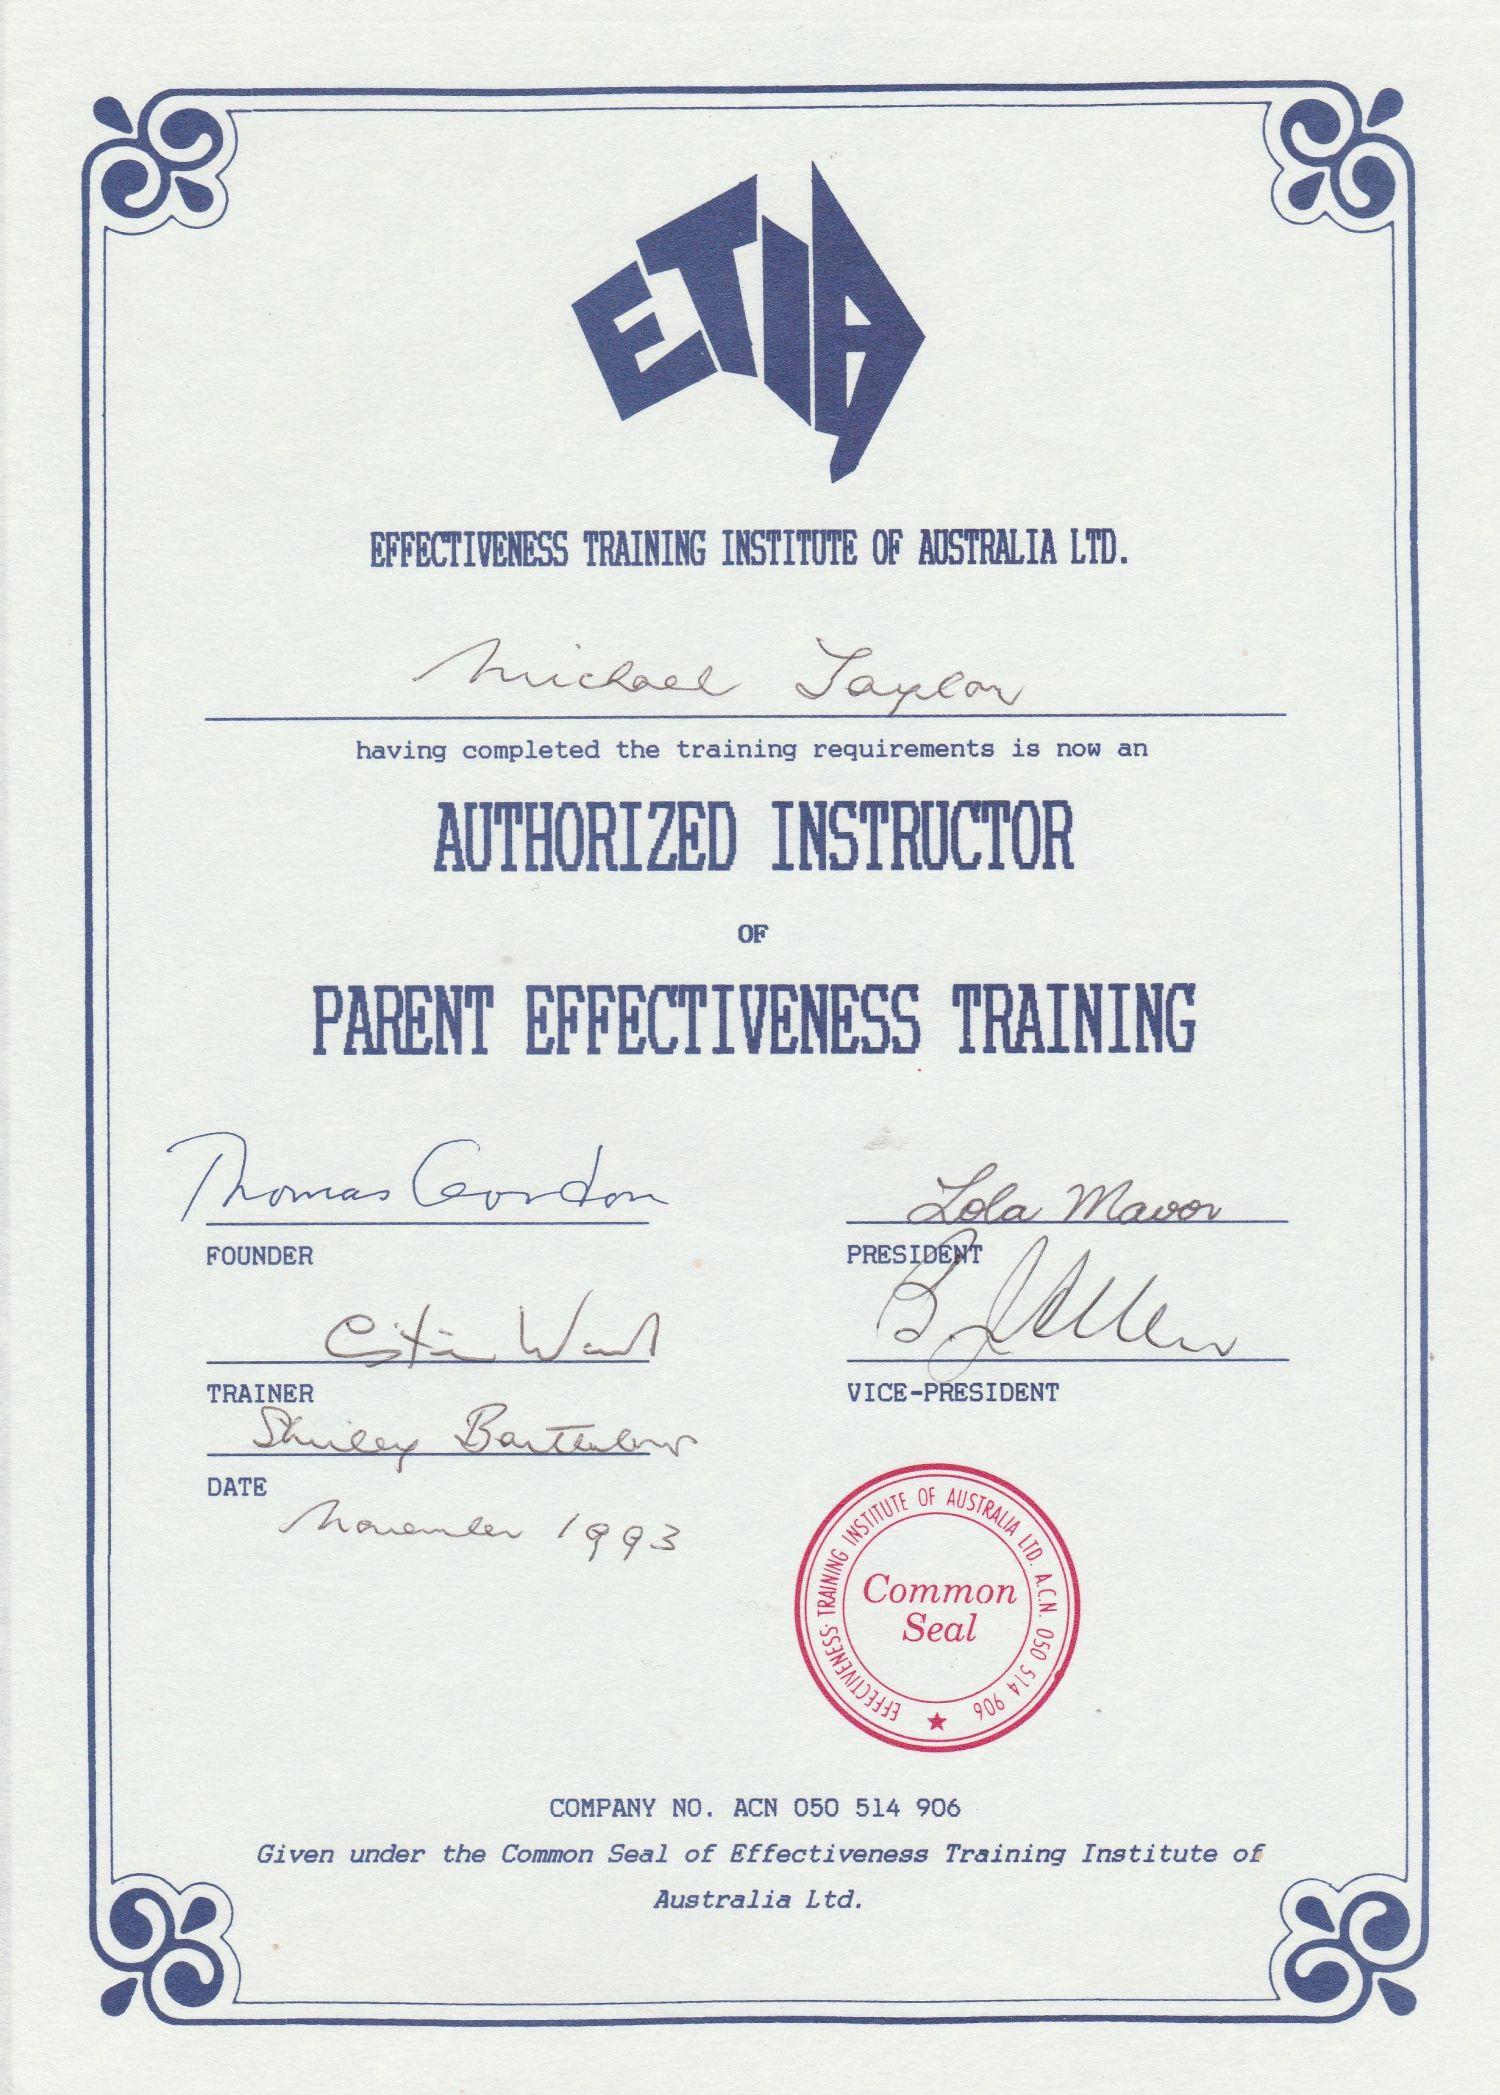 PET - Parent Effectiveness Training certificate